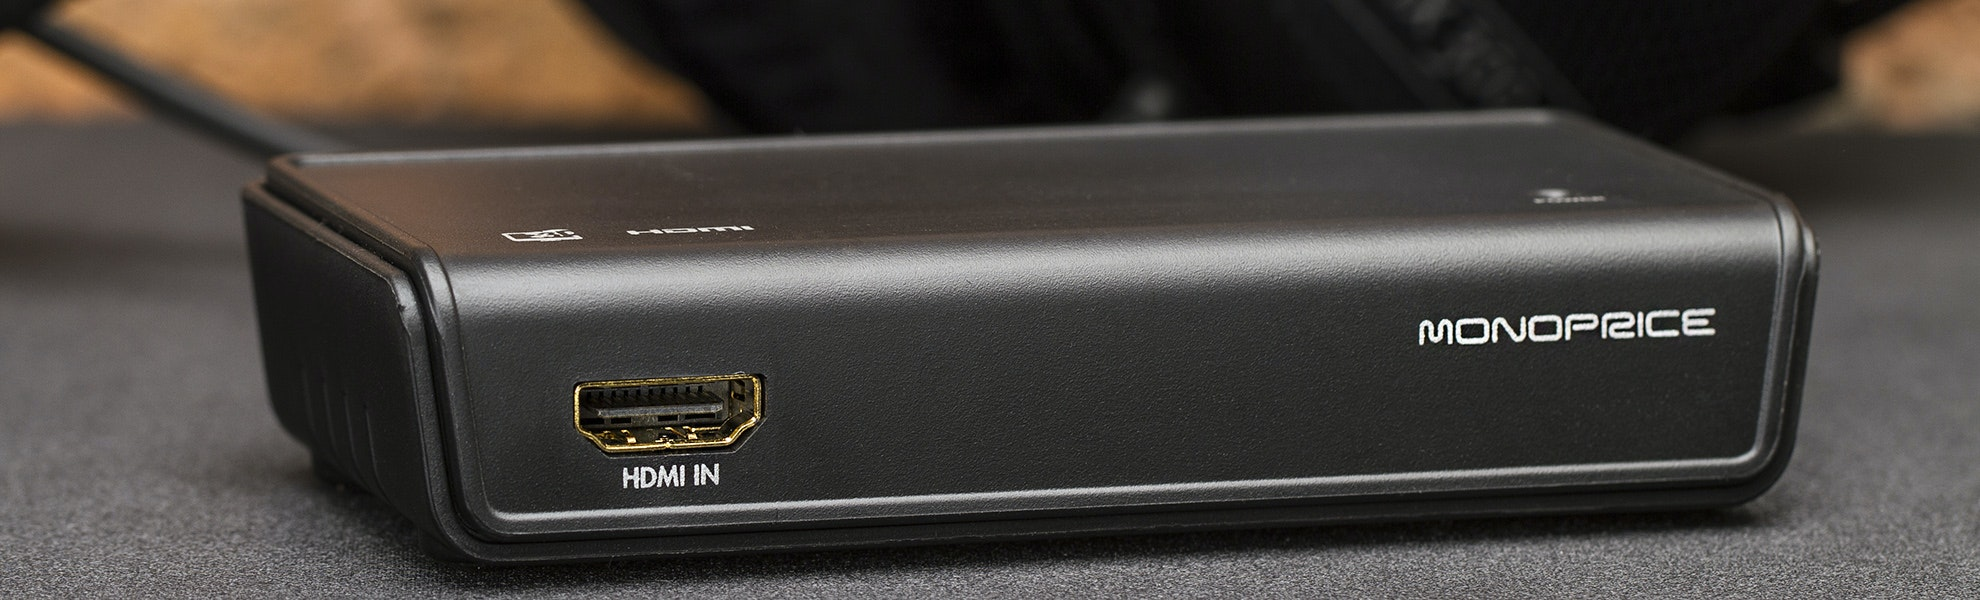 Monoprice HDMI Audio Converter